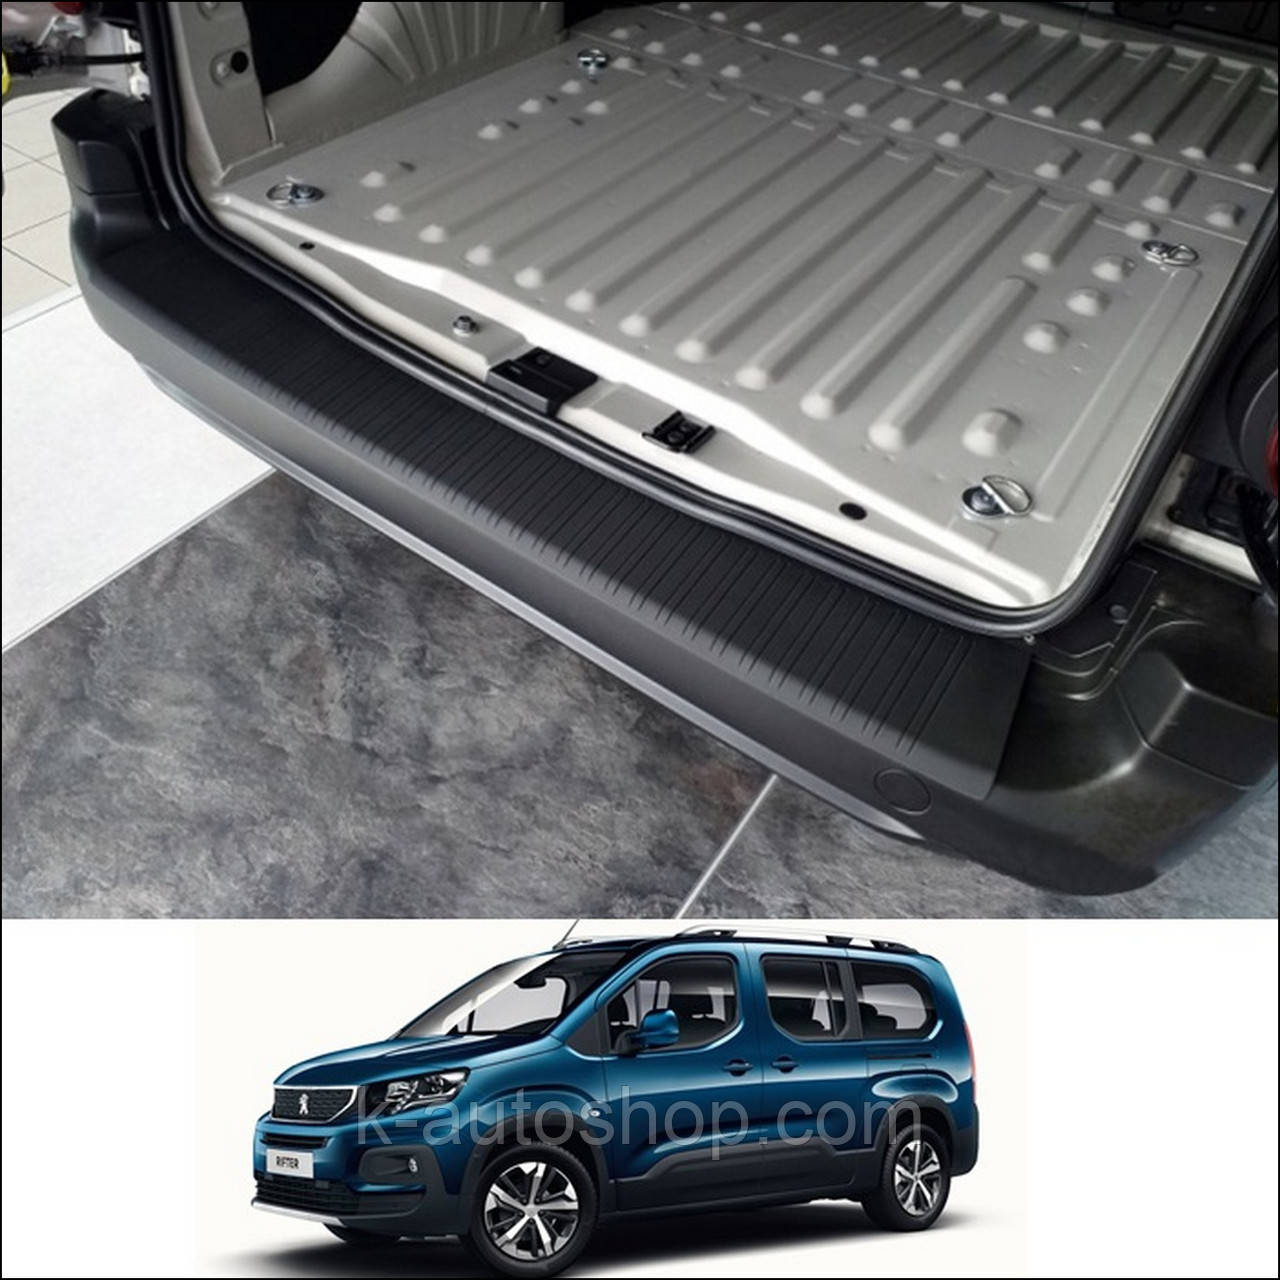 Пластикова захисна накладка на задній бампер для Peugeot Rifter / Partner lll 2018+